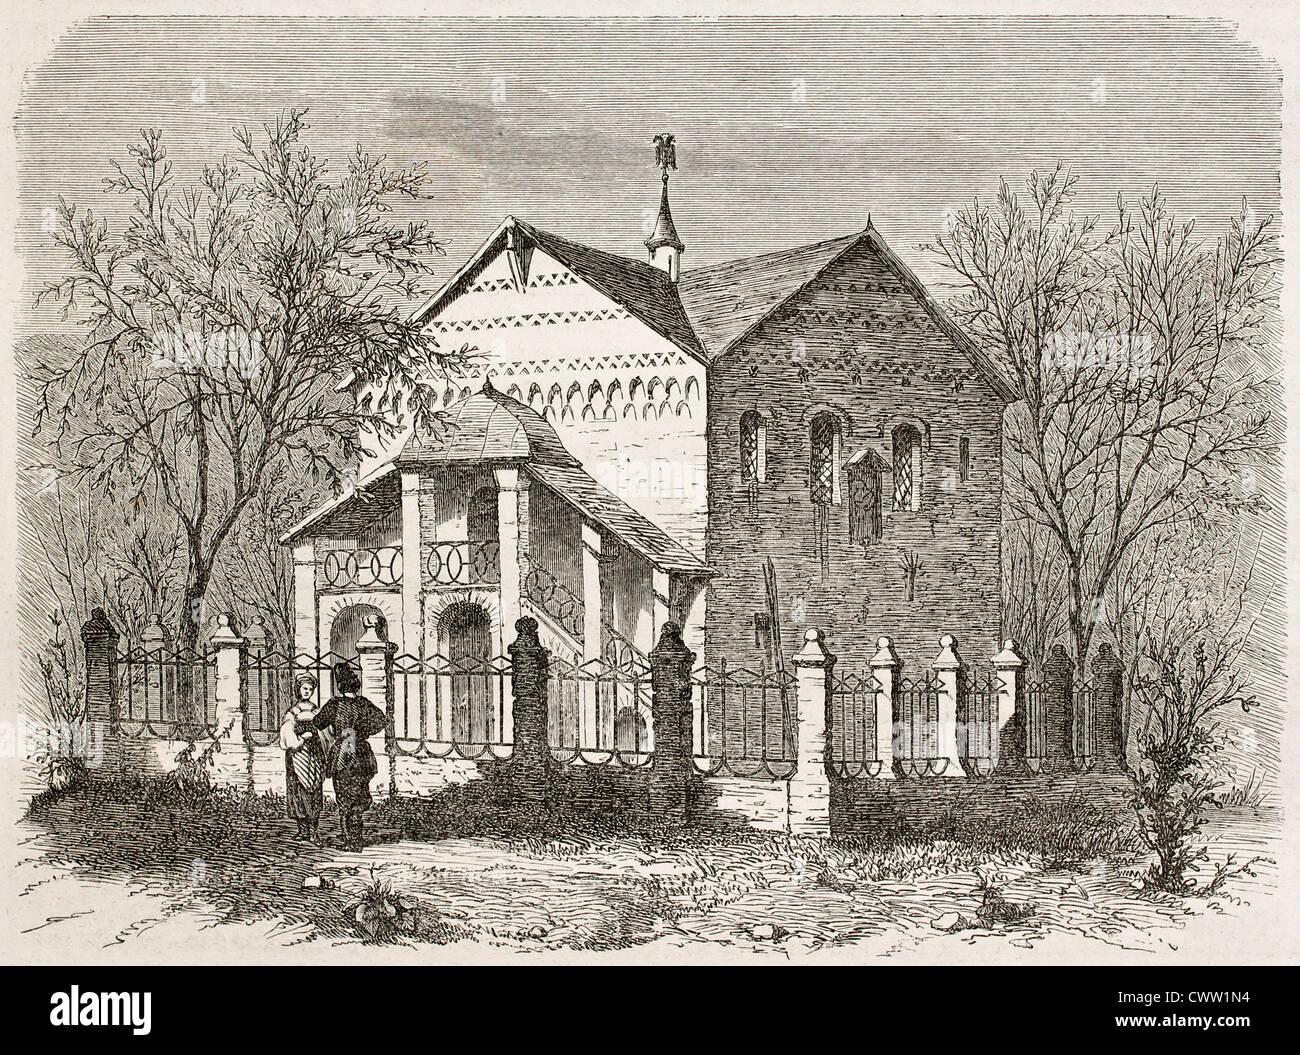 Old view of a Uglich edifice, Russia - Stock Image